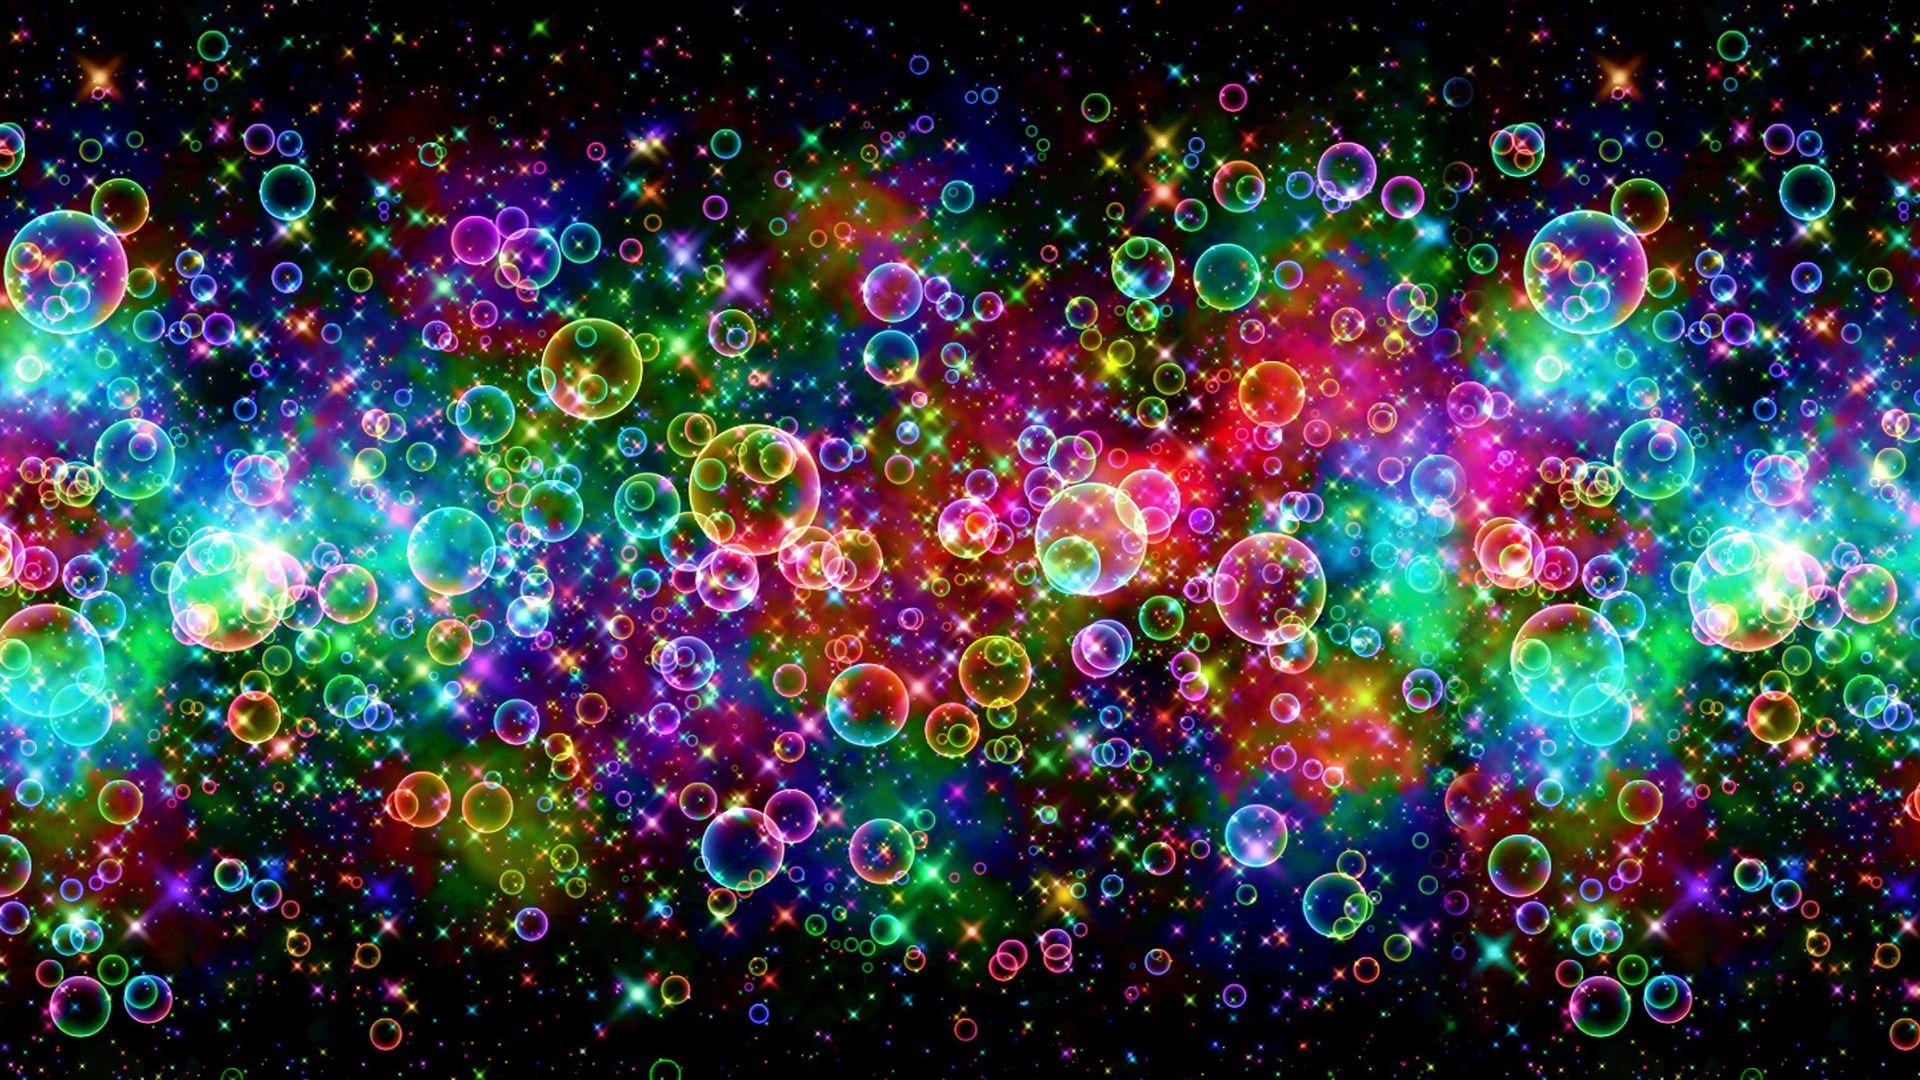 Hd wallpaper colorful - Colorful Desktops Description Colorful Bubbles Wallpaper Is Wallapers For Pc Desktop